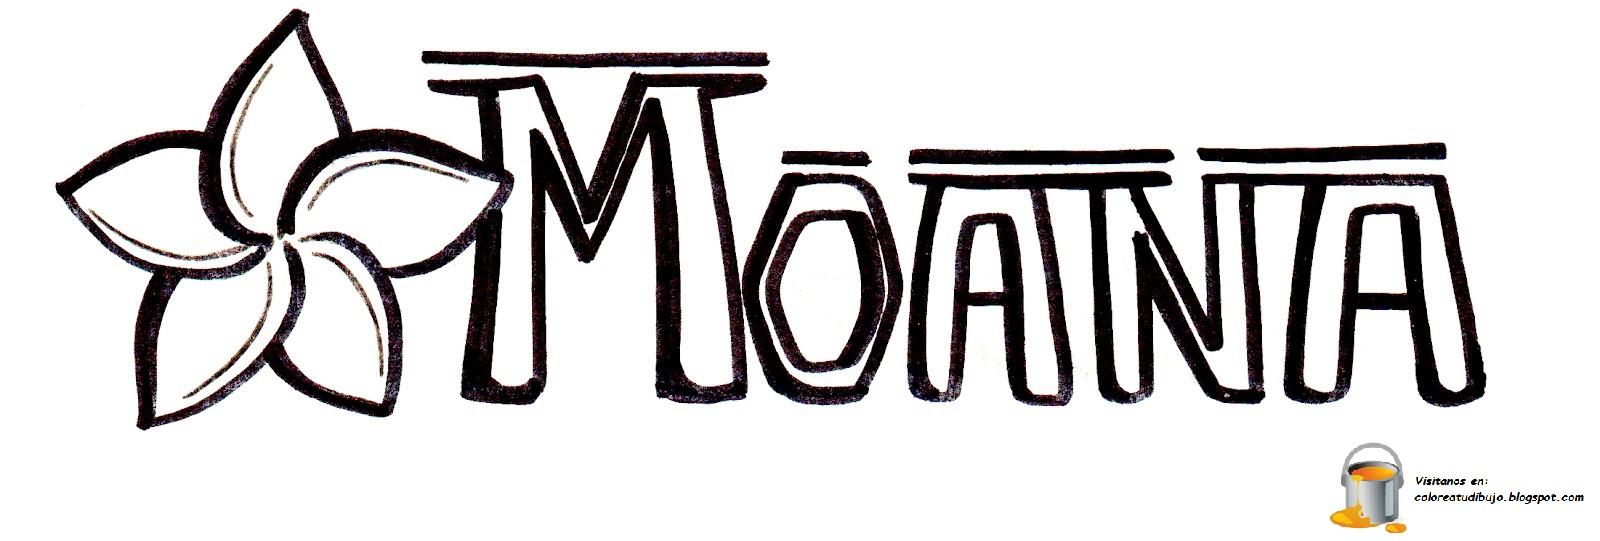 Dibujo Para Colorear De Maui Personaje Película Moana: Dibujos Para Colorear De Moana